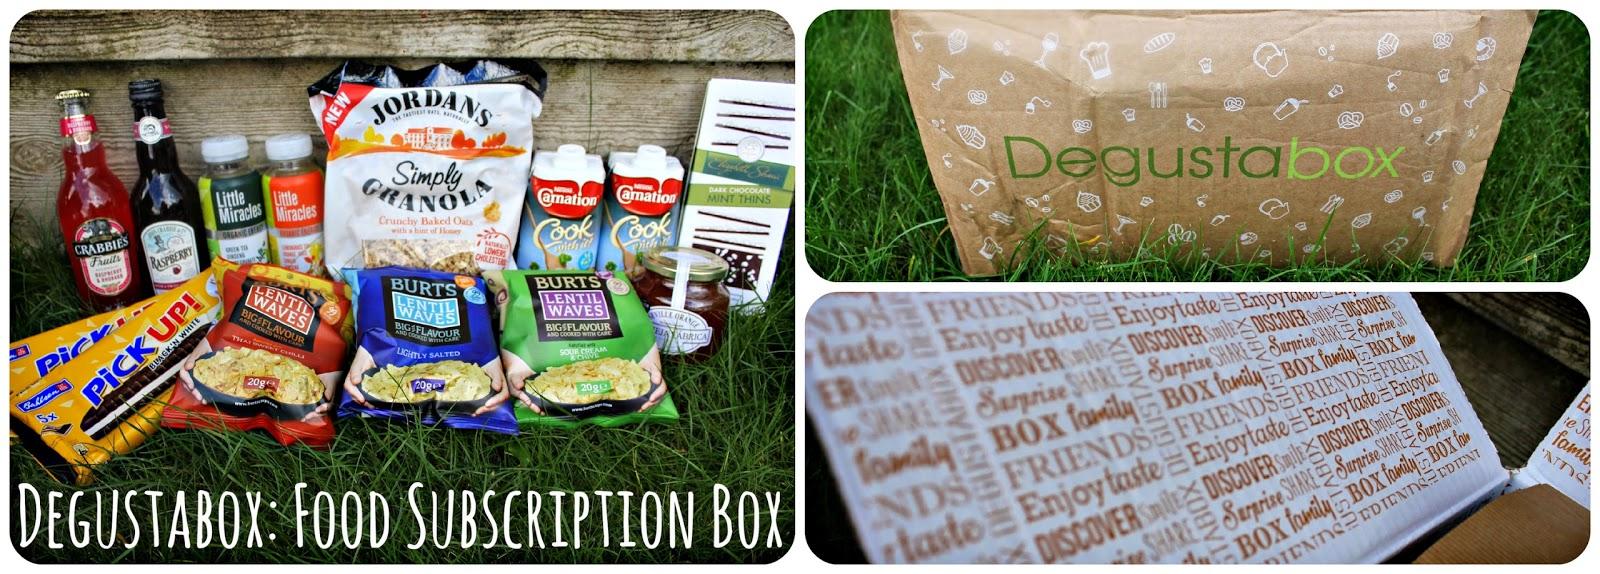 Degustabox: Food Subscription Box